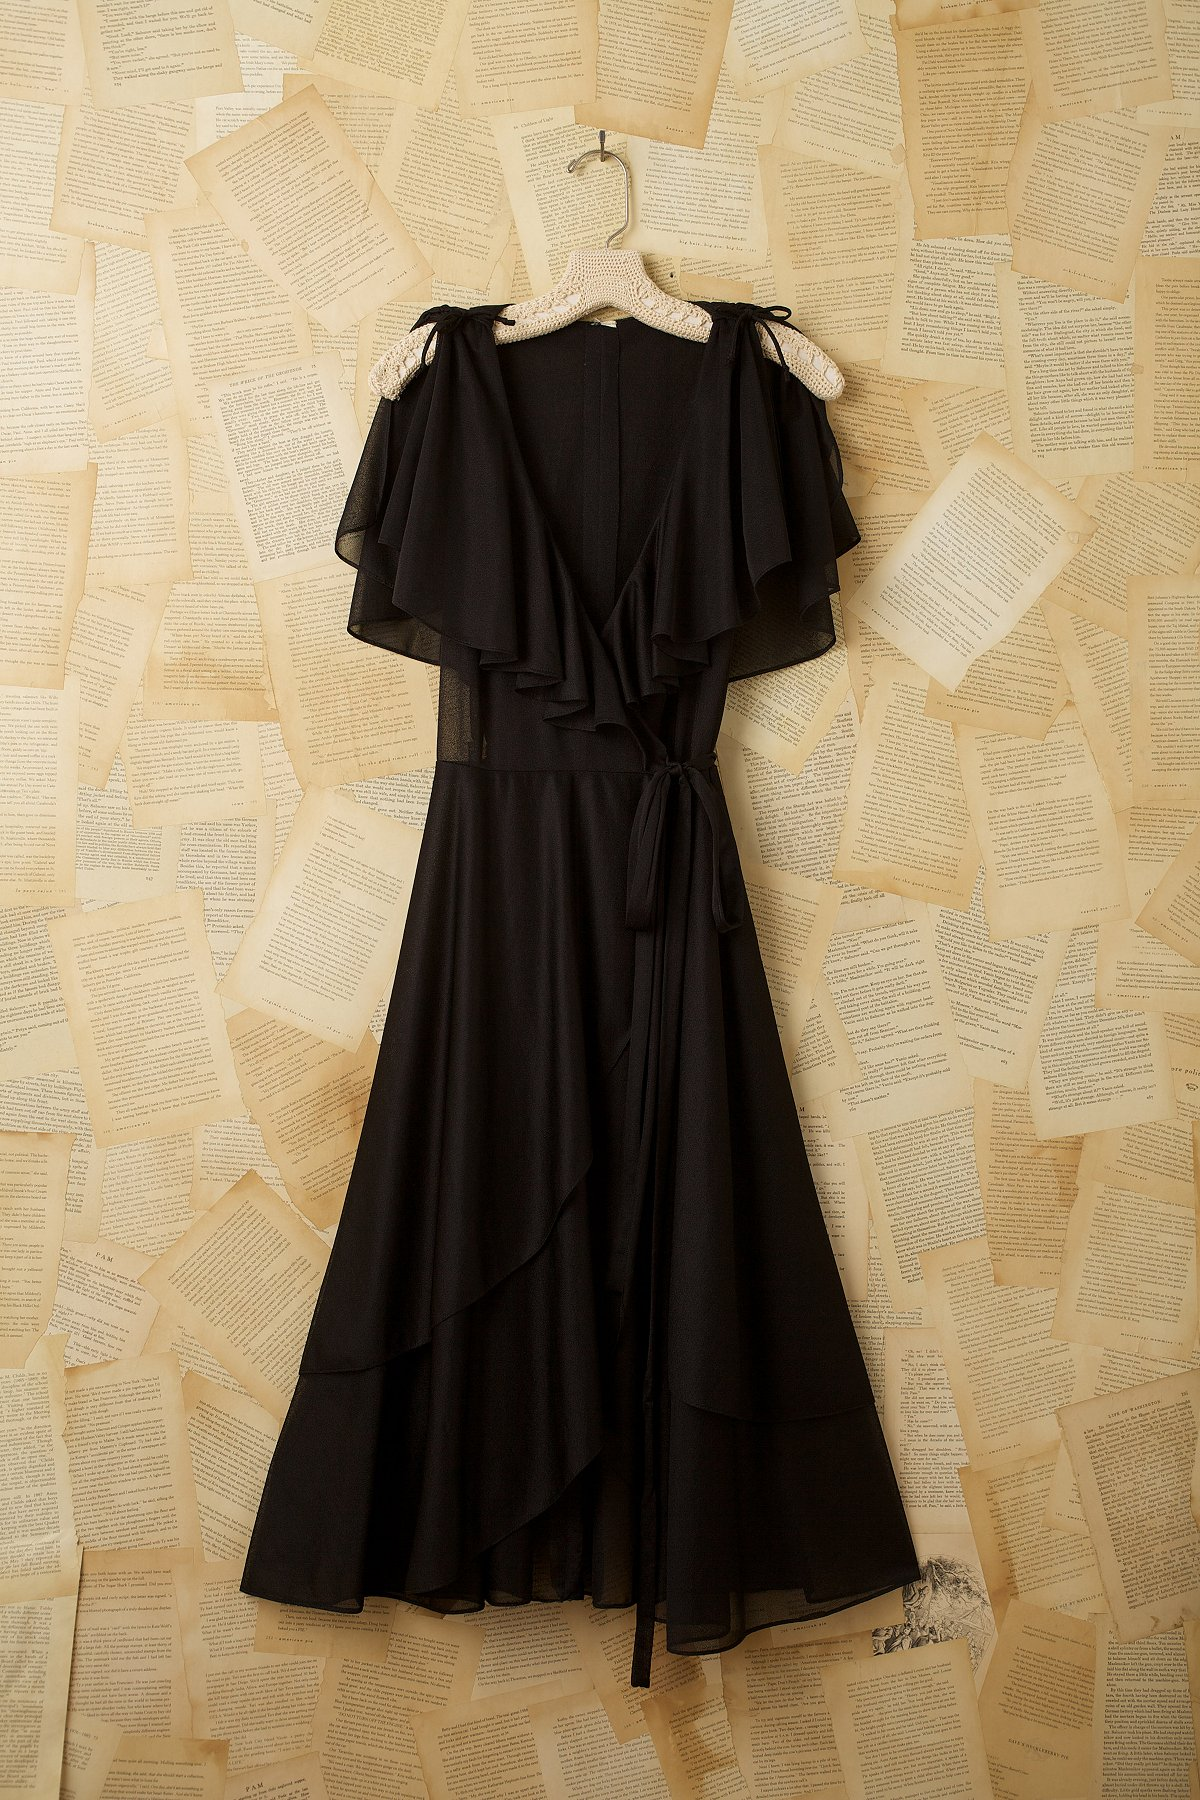 Vintage Sheer Wrap Dress